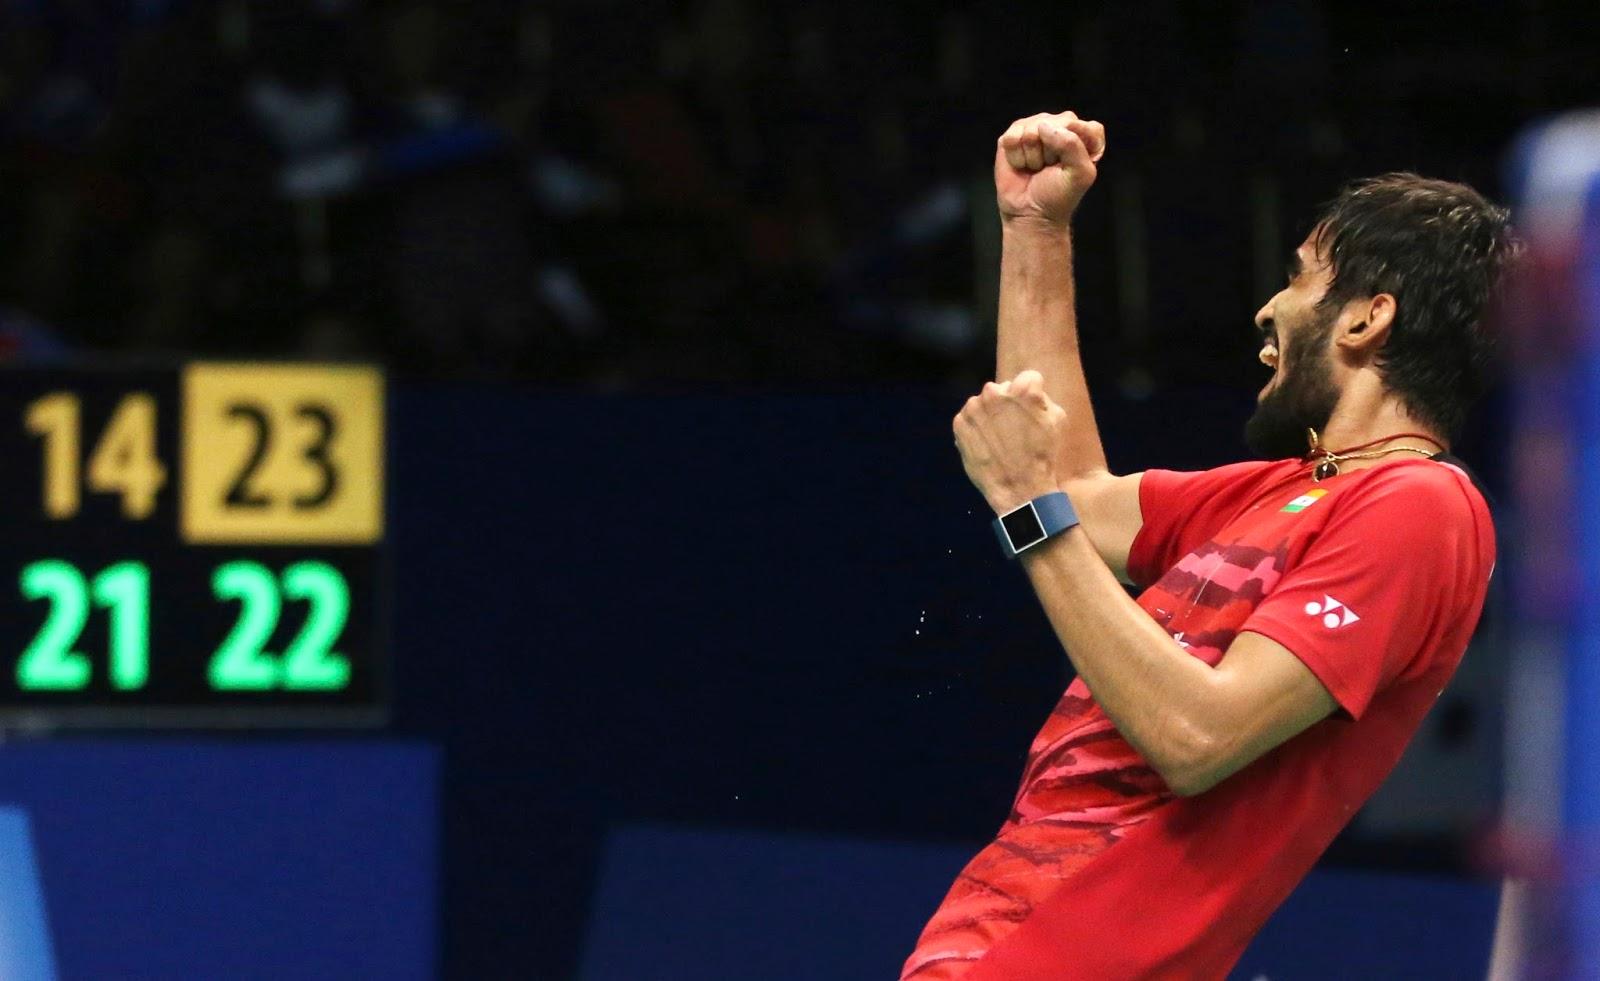 Srikanth Kidambi reaches his third consecutive super series final